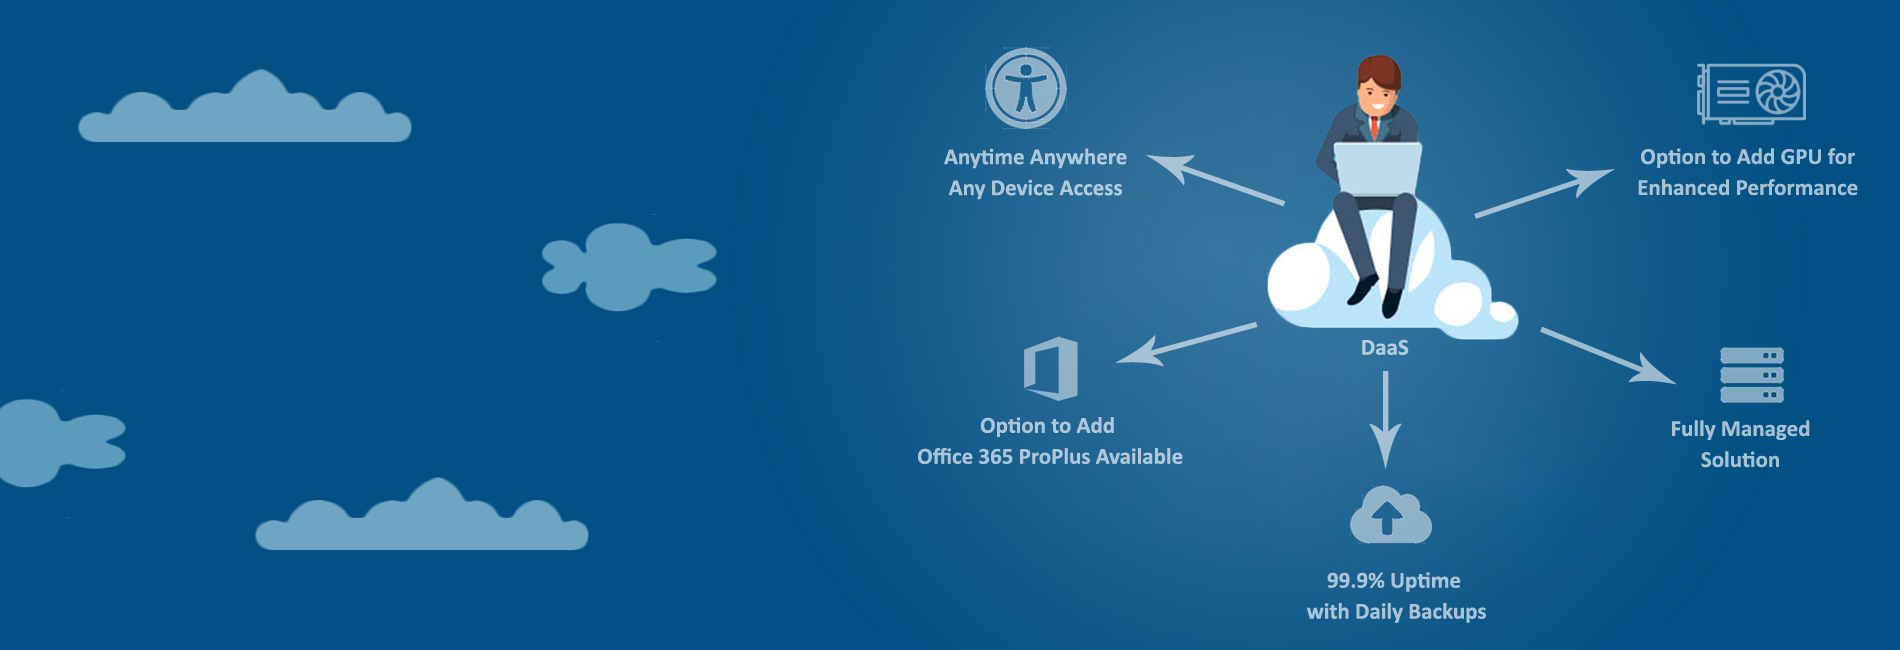 Virtual Desktop Offers